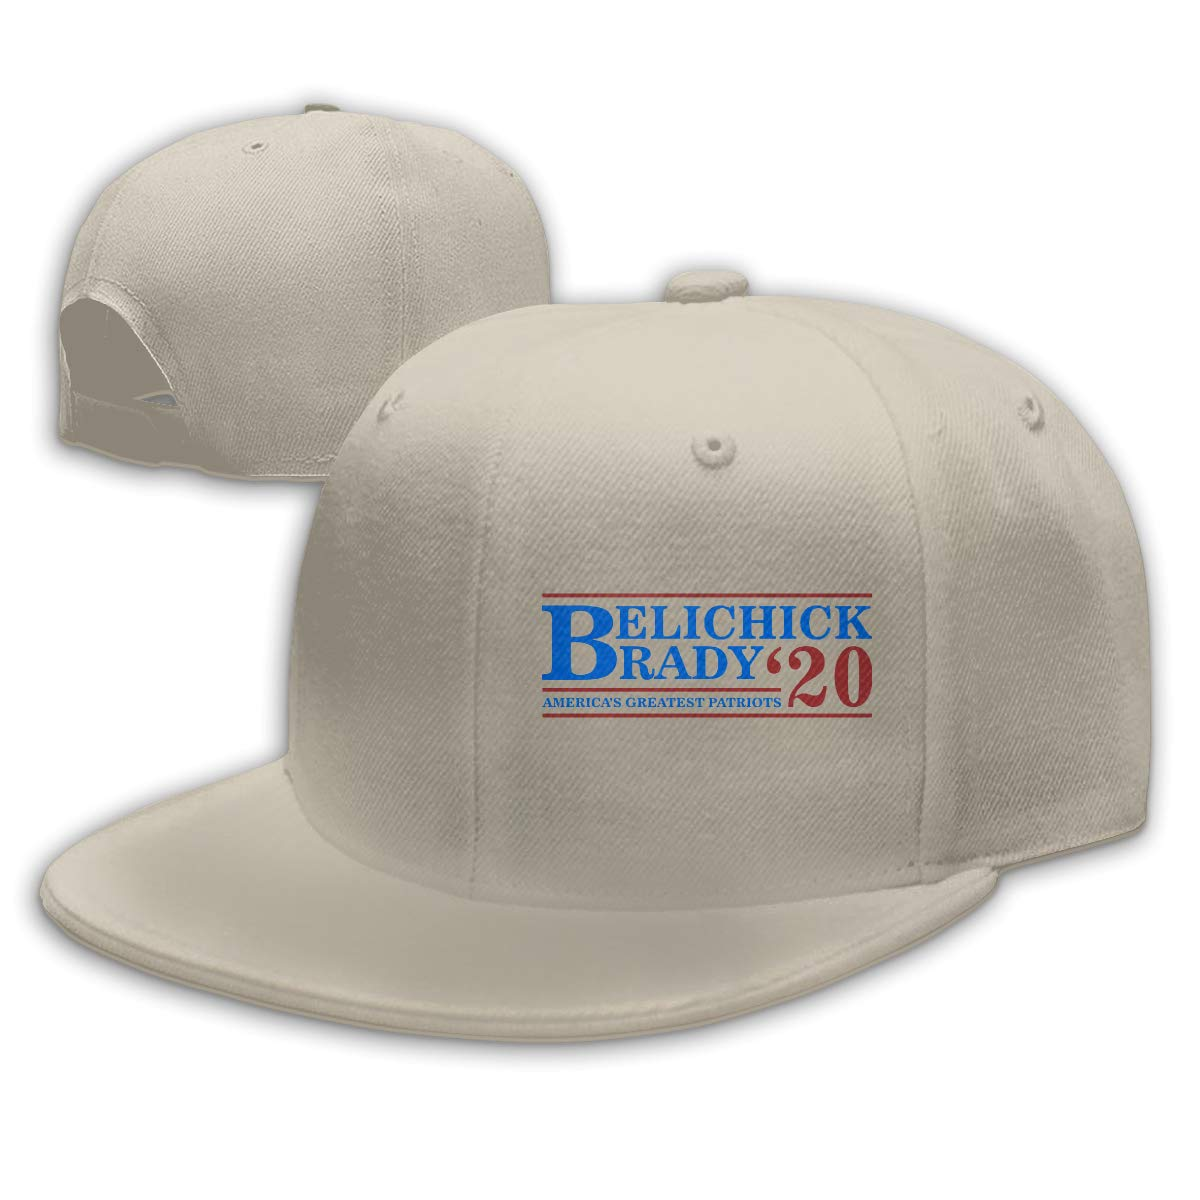 Belichick and Brady for President 2020 Unisex Snapback Hats Flat Bill Baseball Cap Dad Hat